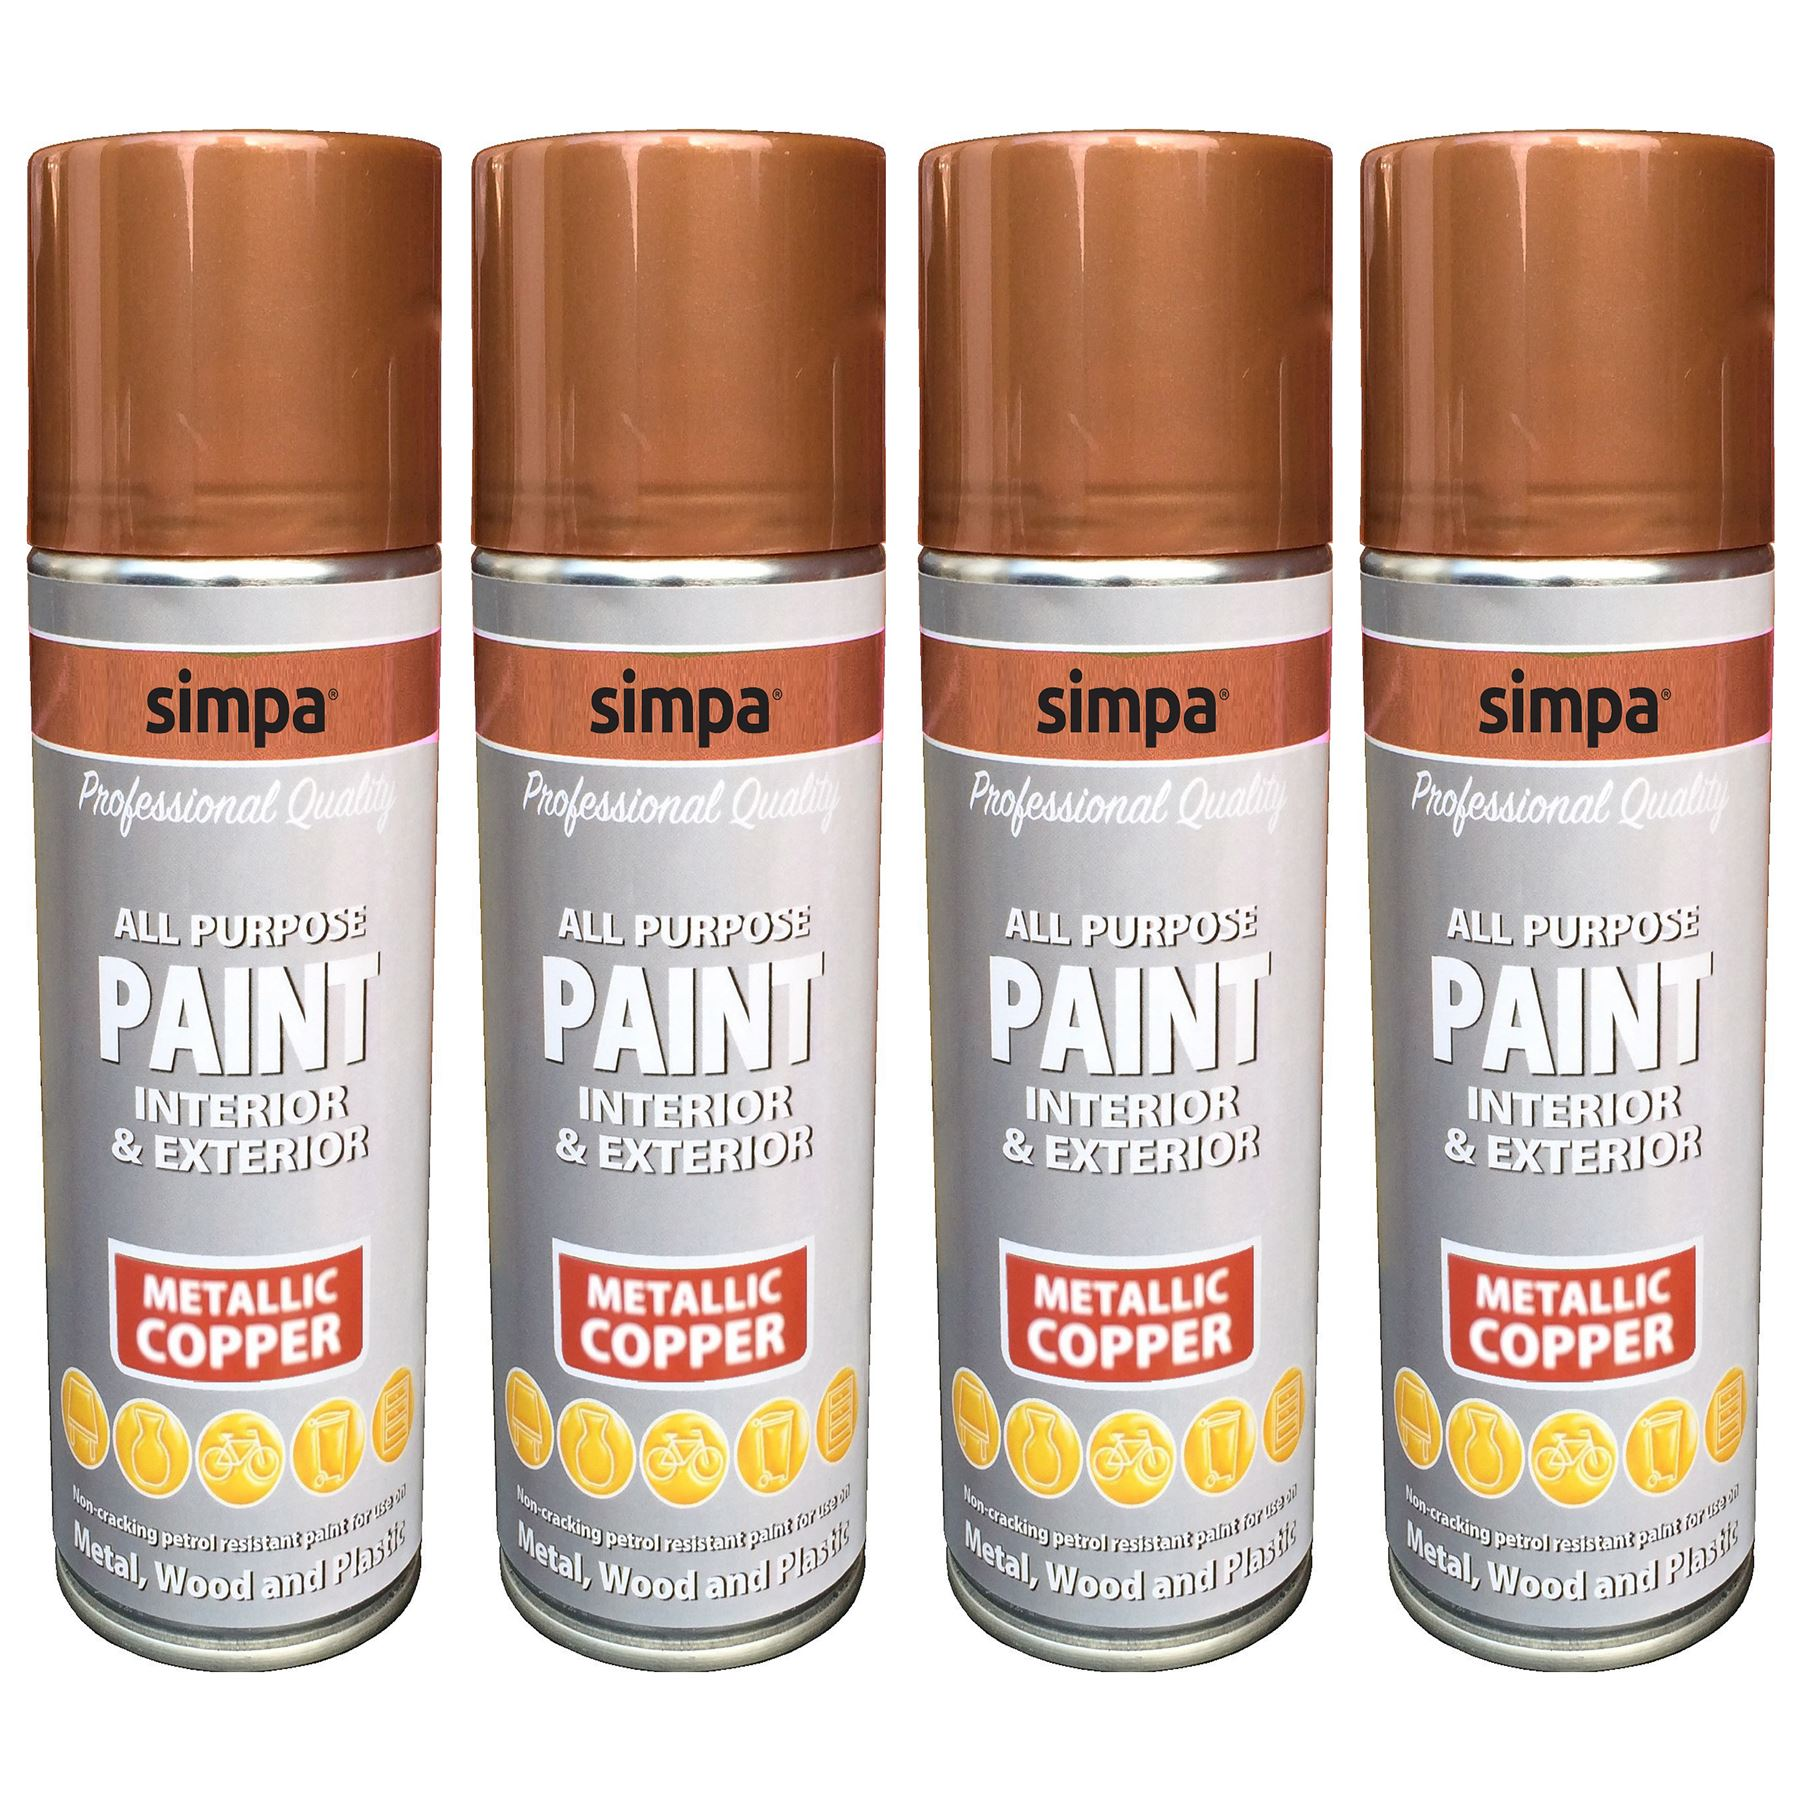 Interior Spray Paint Spraying Interior Walls With And Airless Sprayer Paint Sprayer Tips